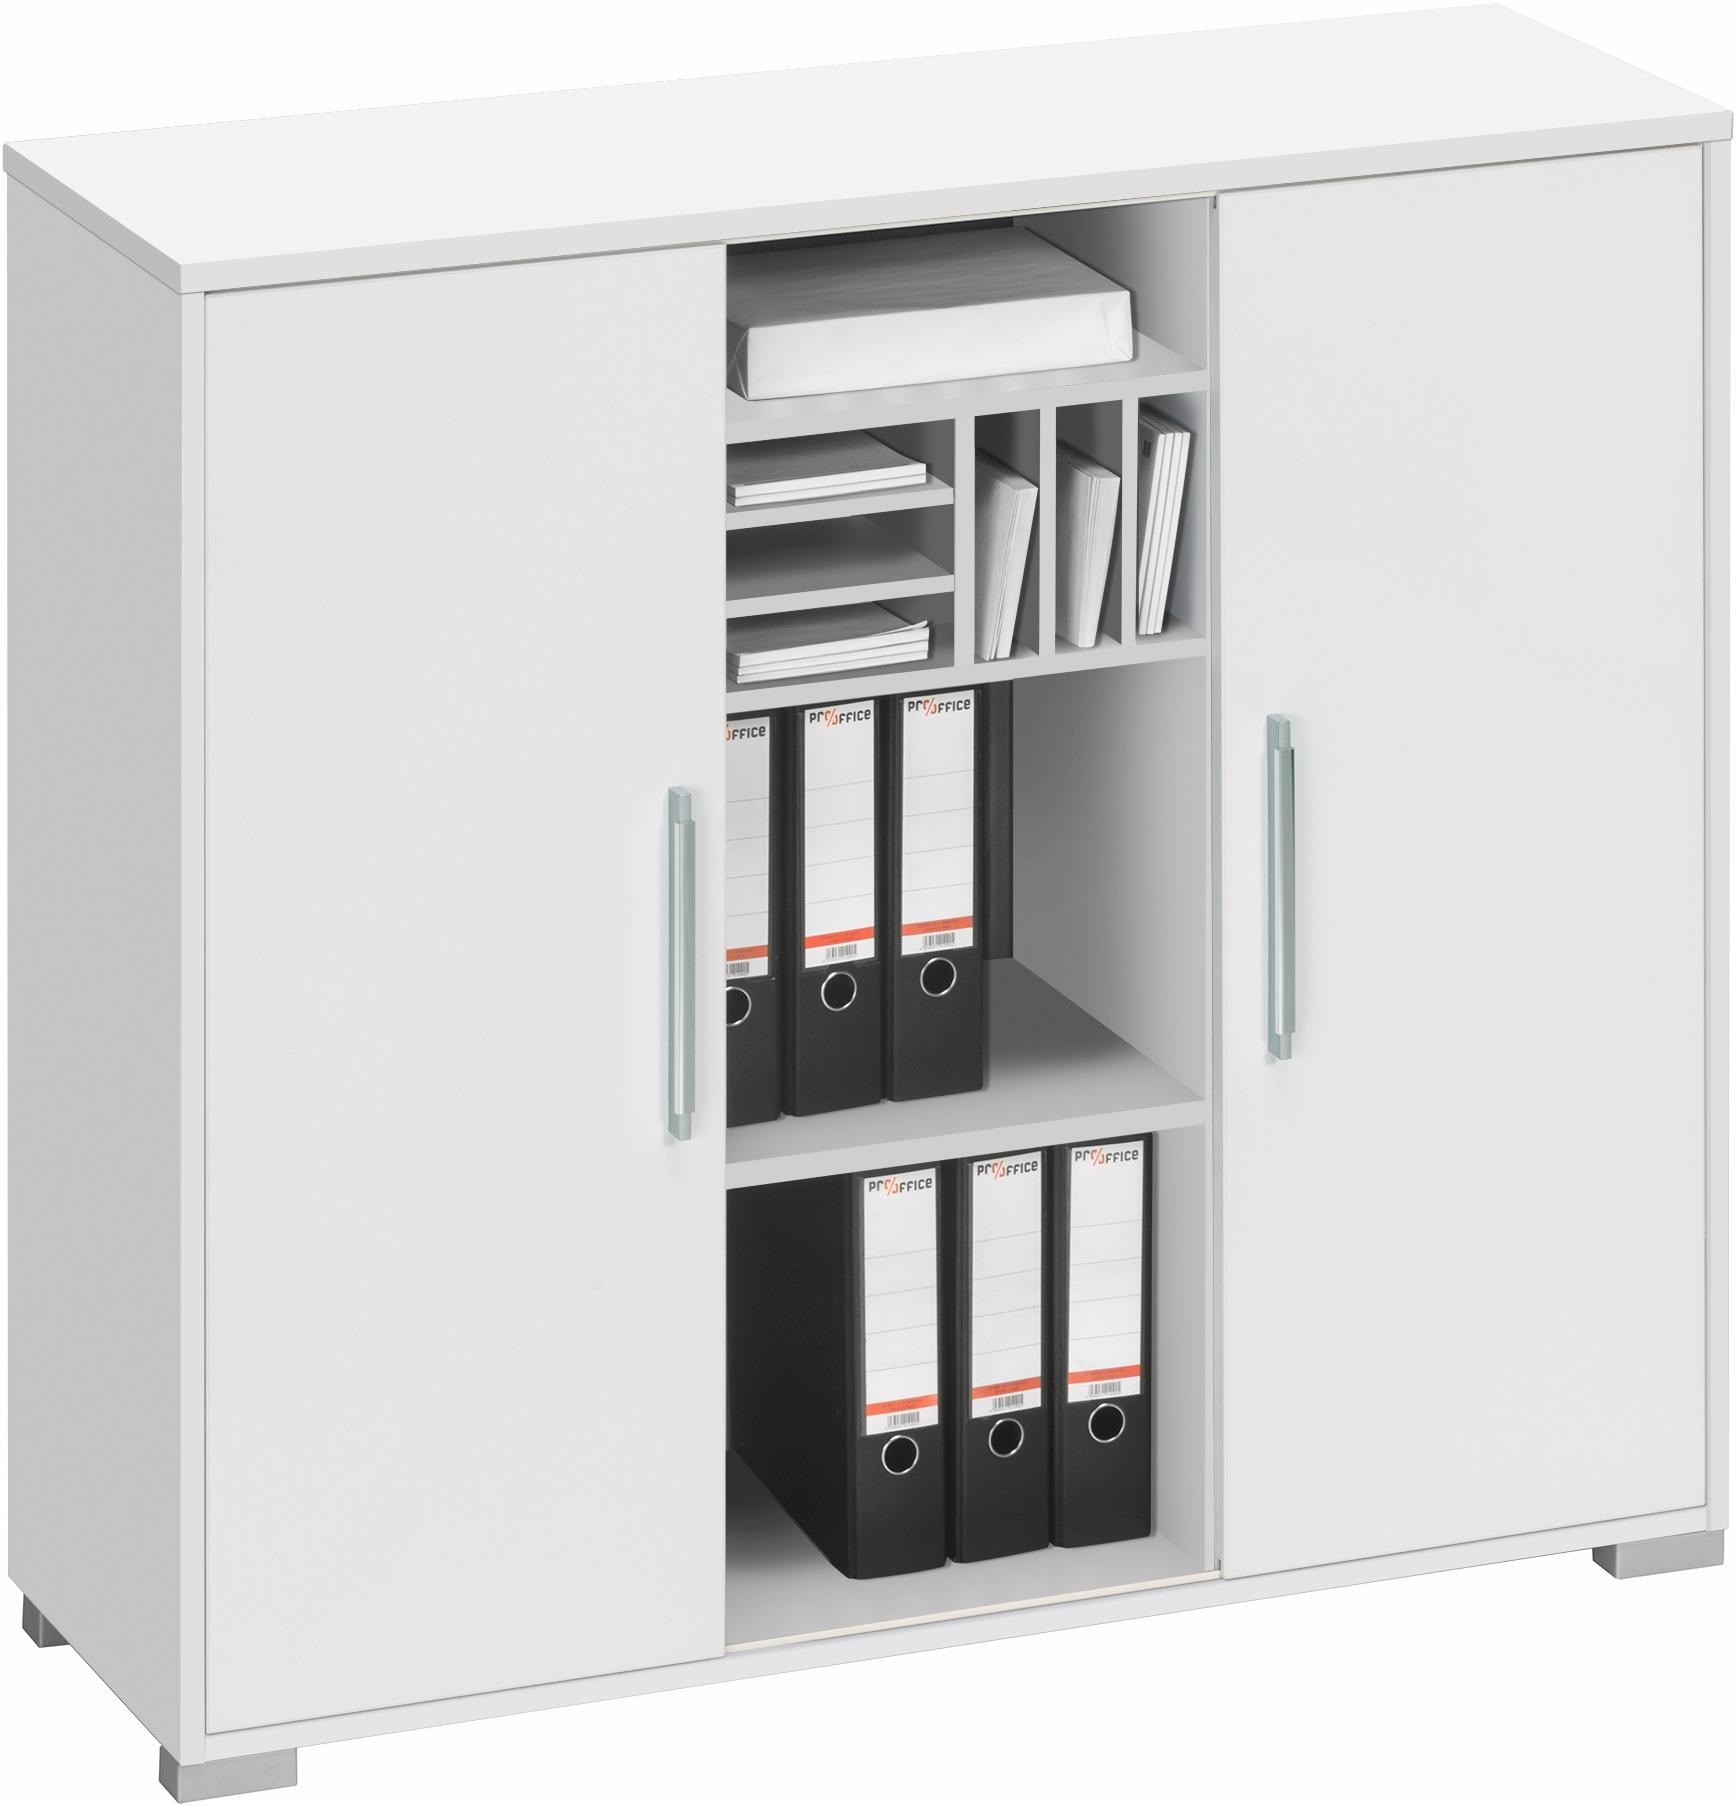 Maja Möbel Sideboard System 1726